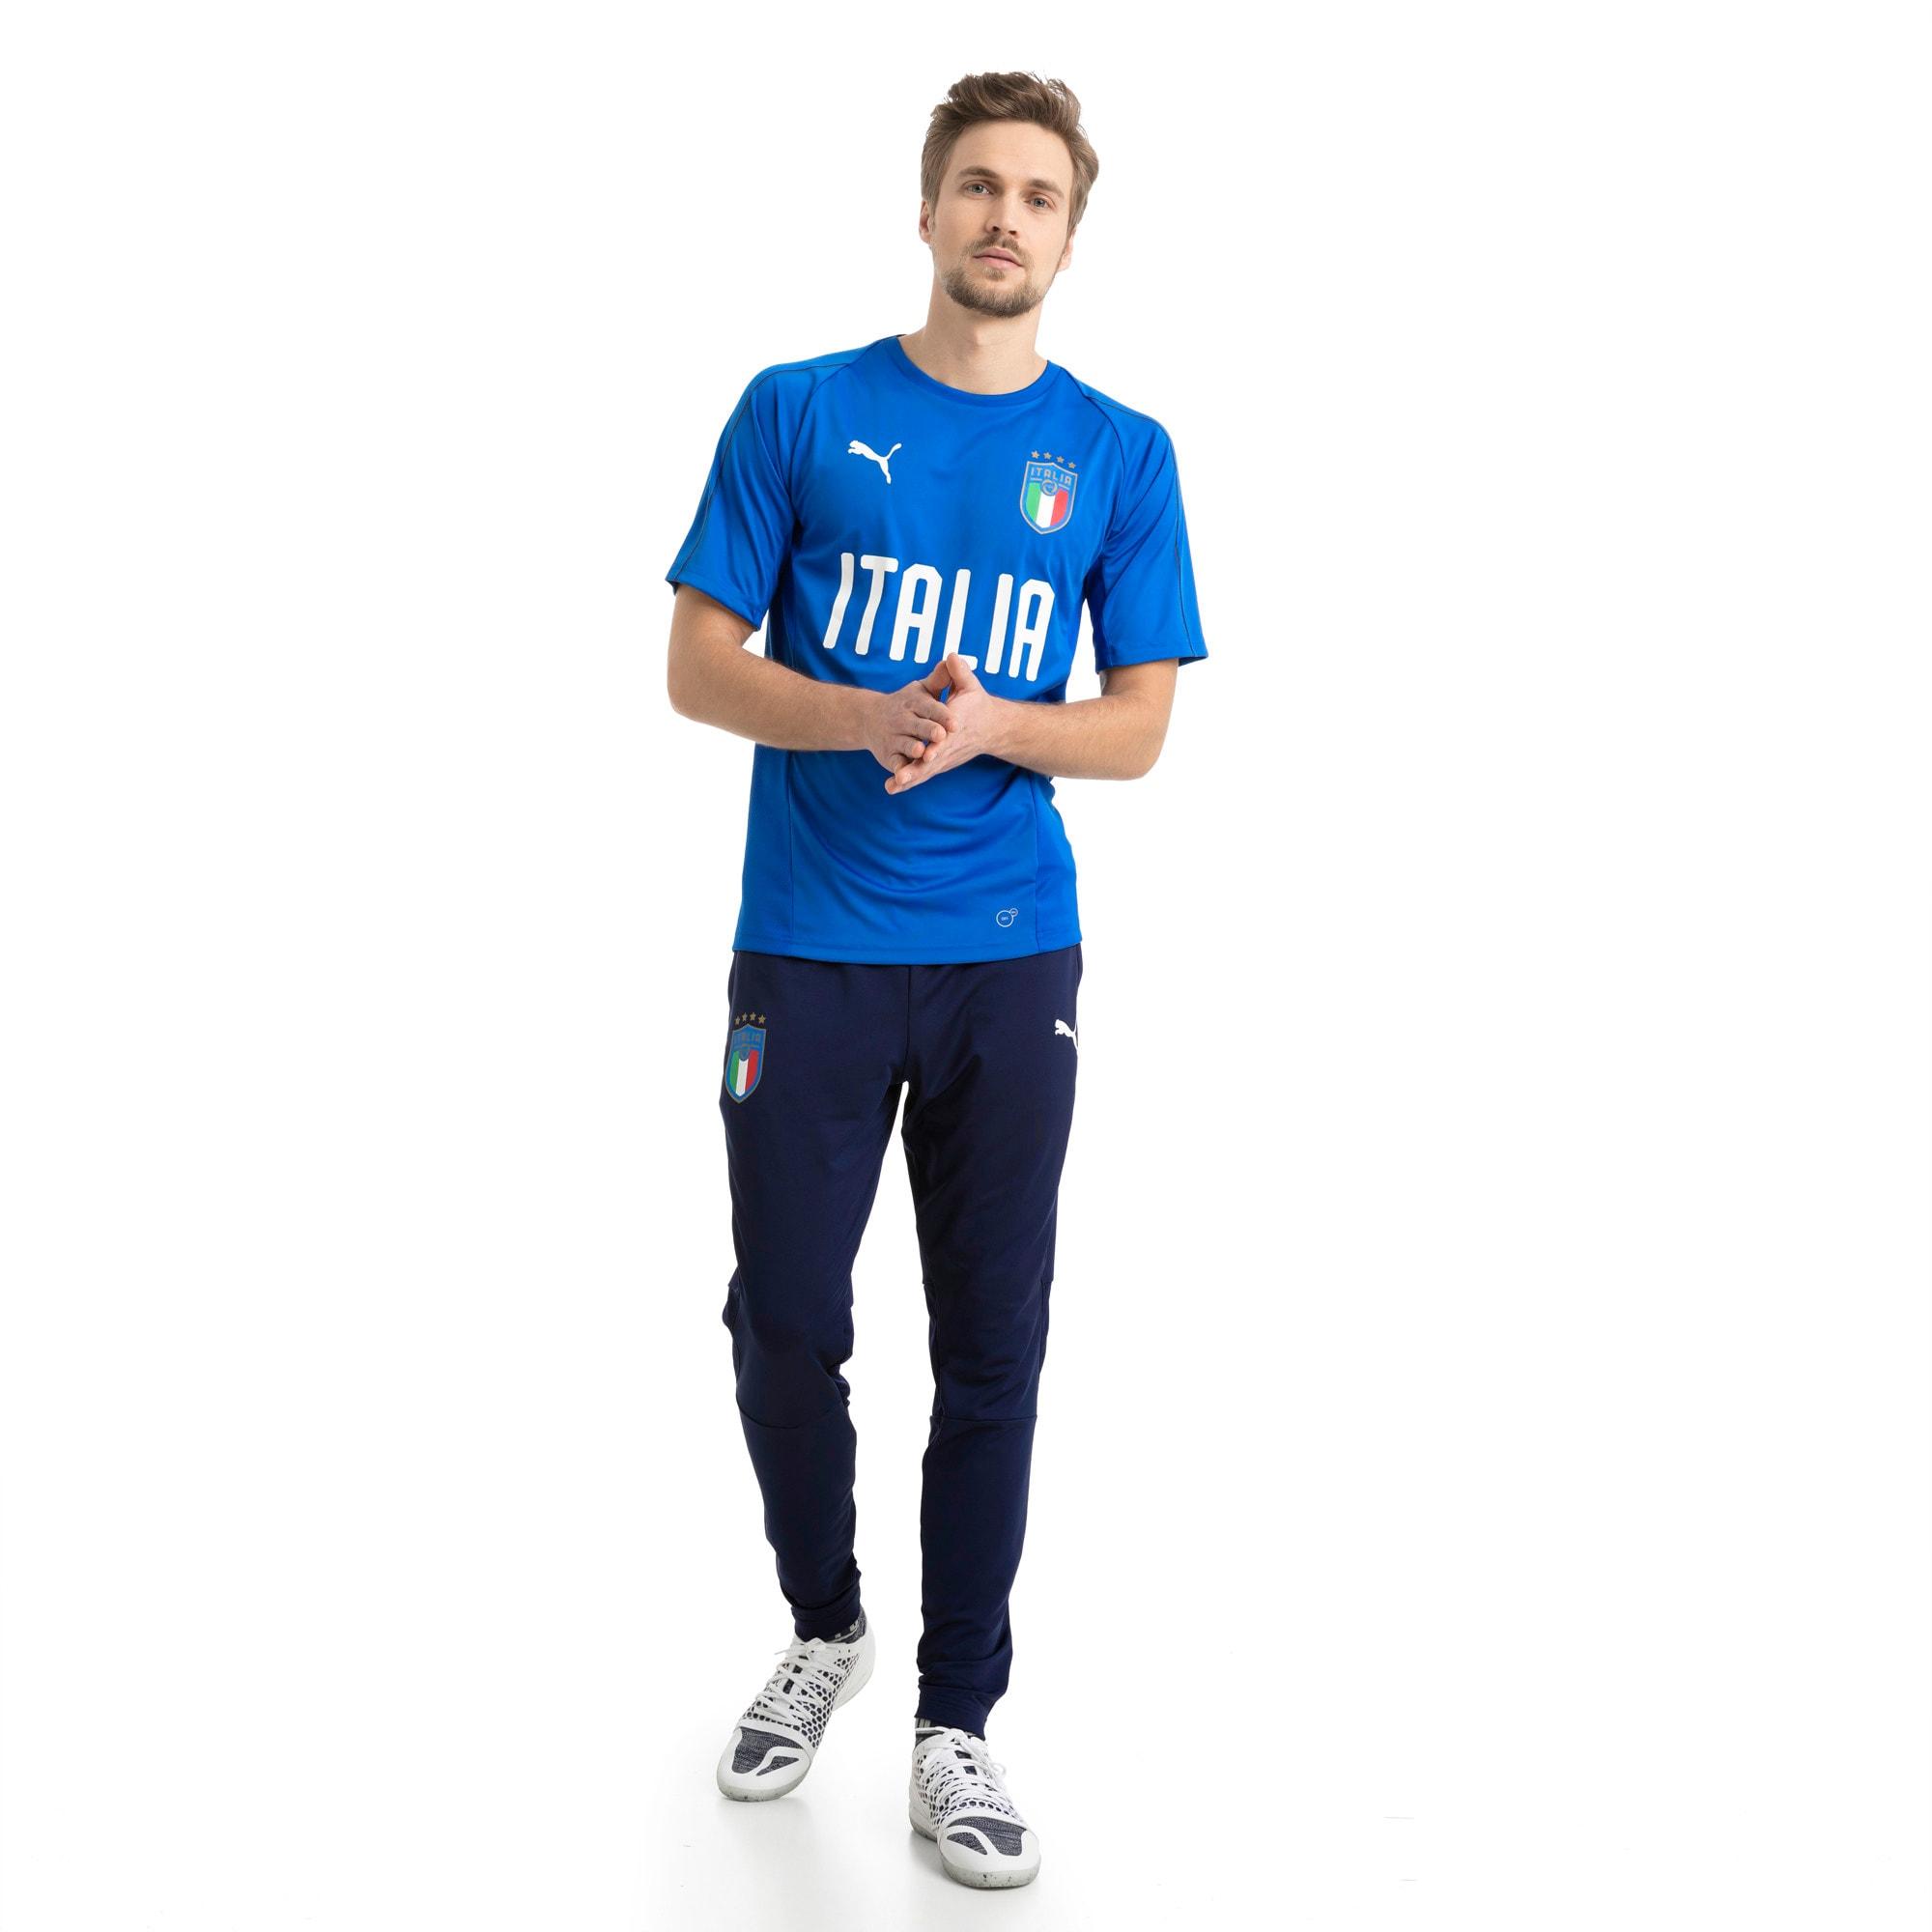 Thumbnail 5 of Italia Training Jersey, Team Power Blue-Puma White, medium